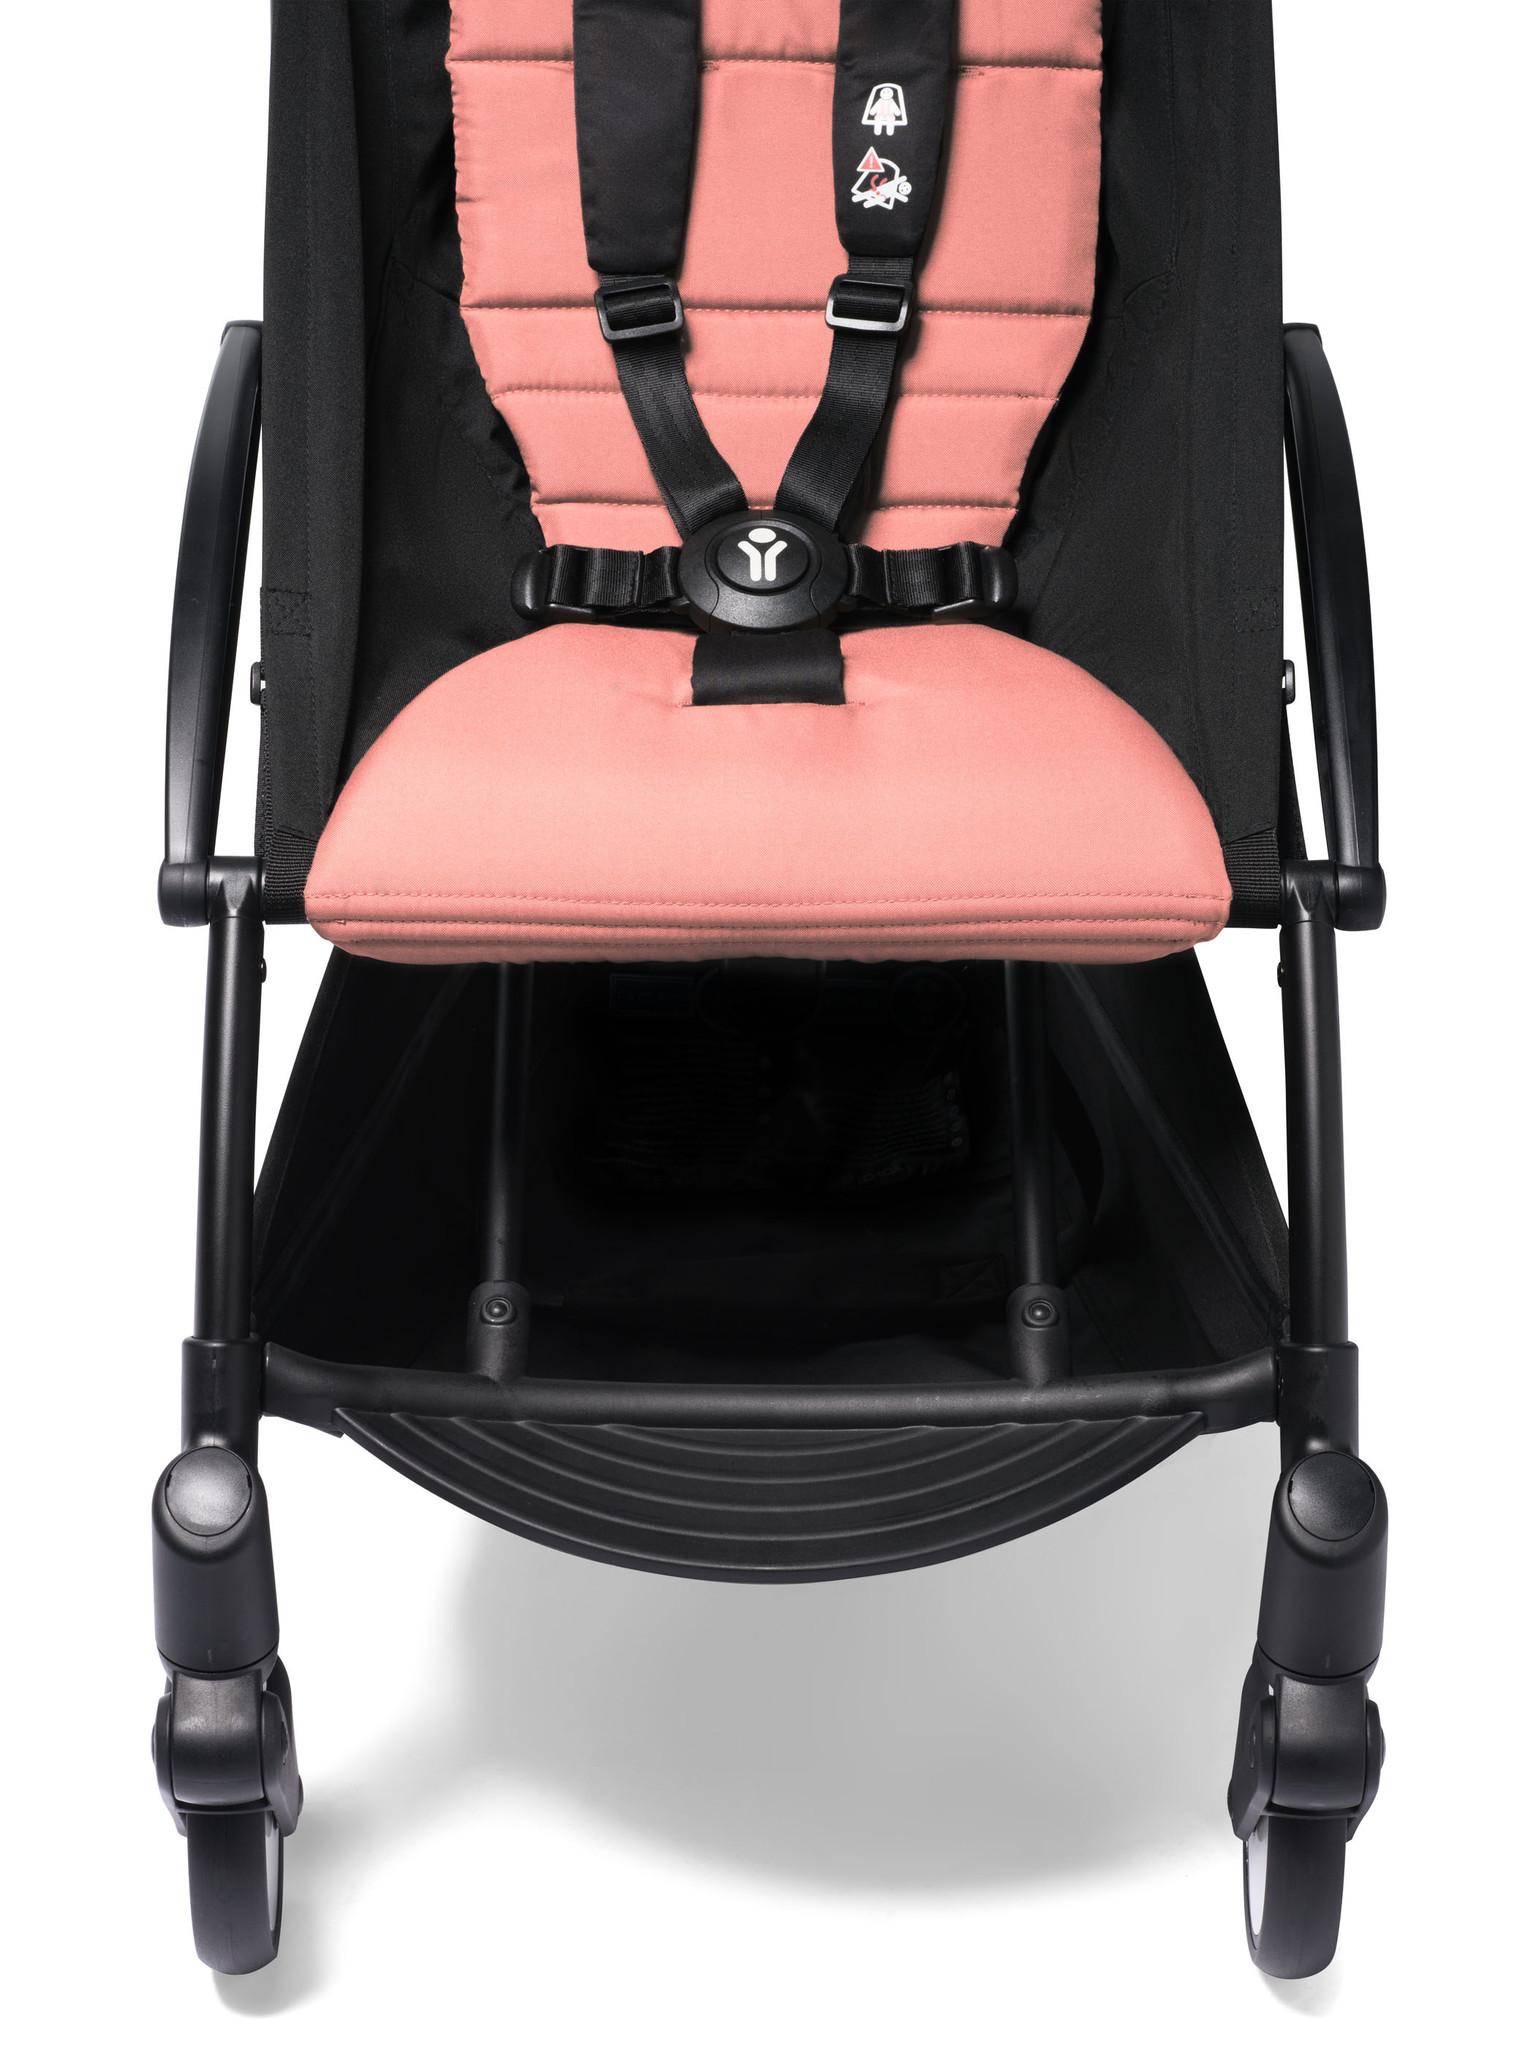 Babyzen Babyzen YOYO² Buggy KOMPLETT / VOLL SET 0+ und 6+ Ingwerrahmen schwarz inkl. YOYO² BeSafe Autositz schwarz